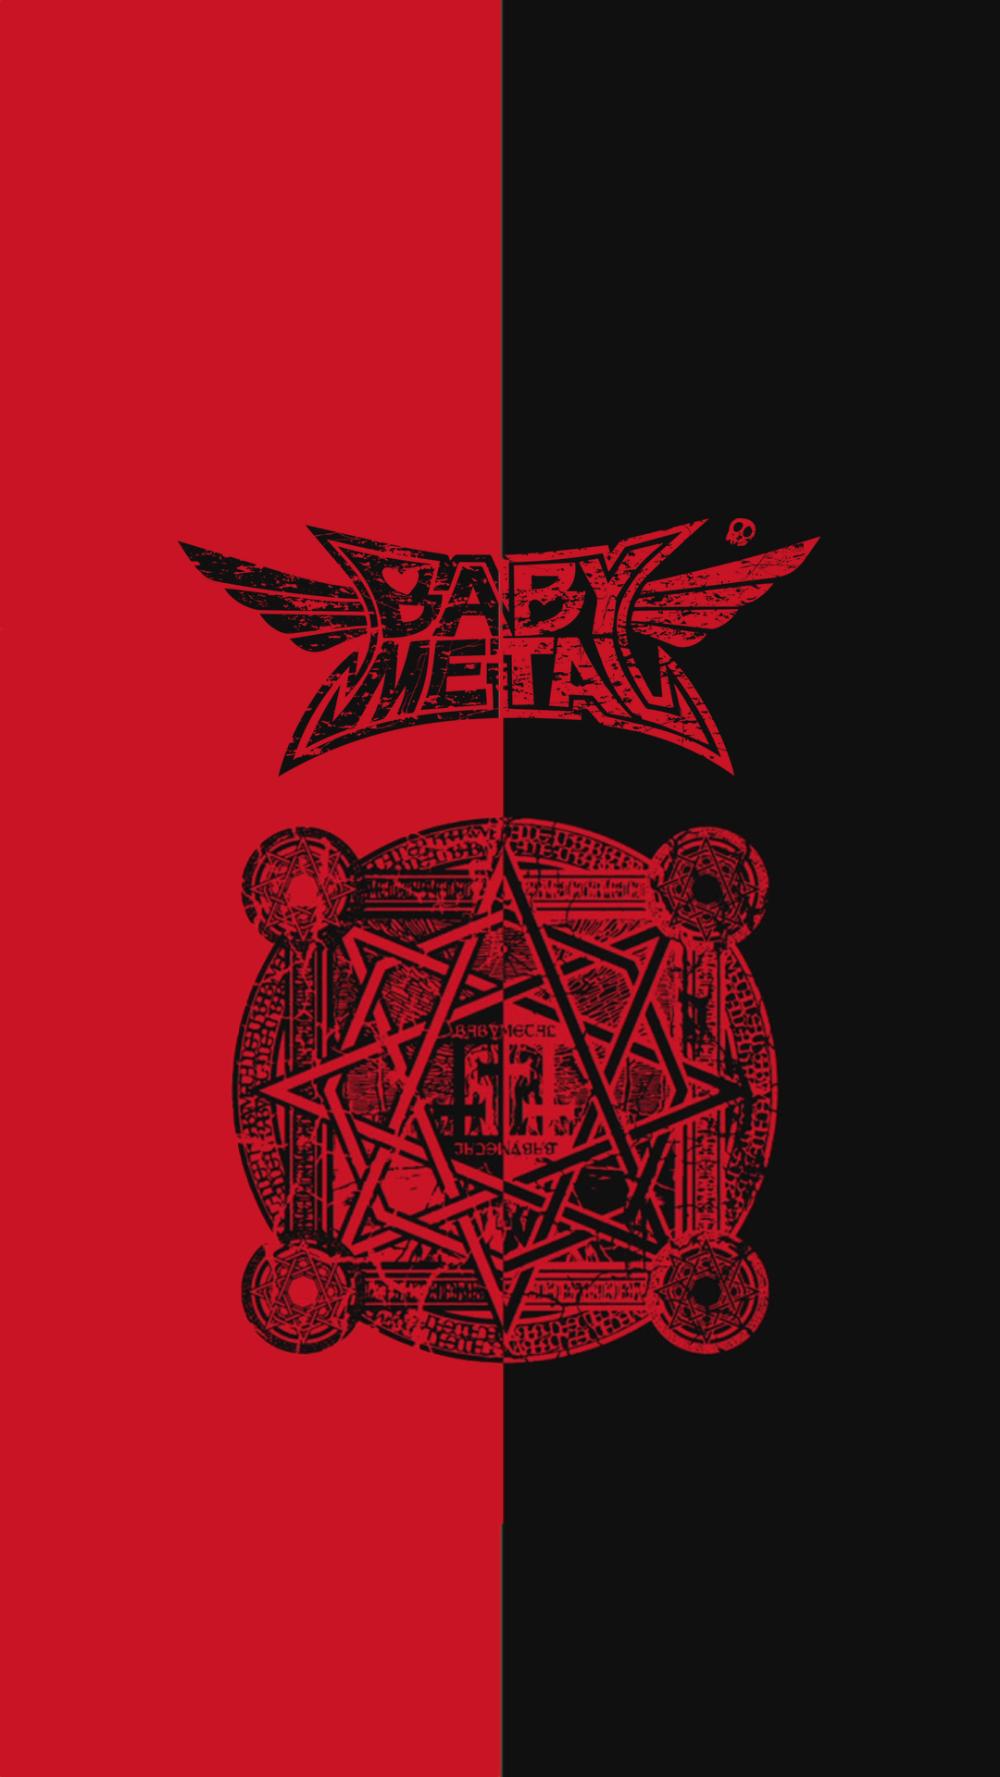 Babymetal かっこいいロゴ 魔法陣 Heavy Metal Metal Bands Heavy